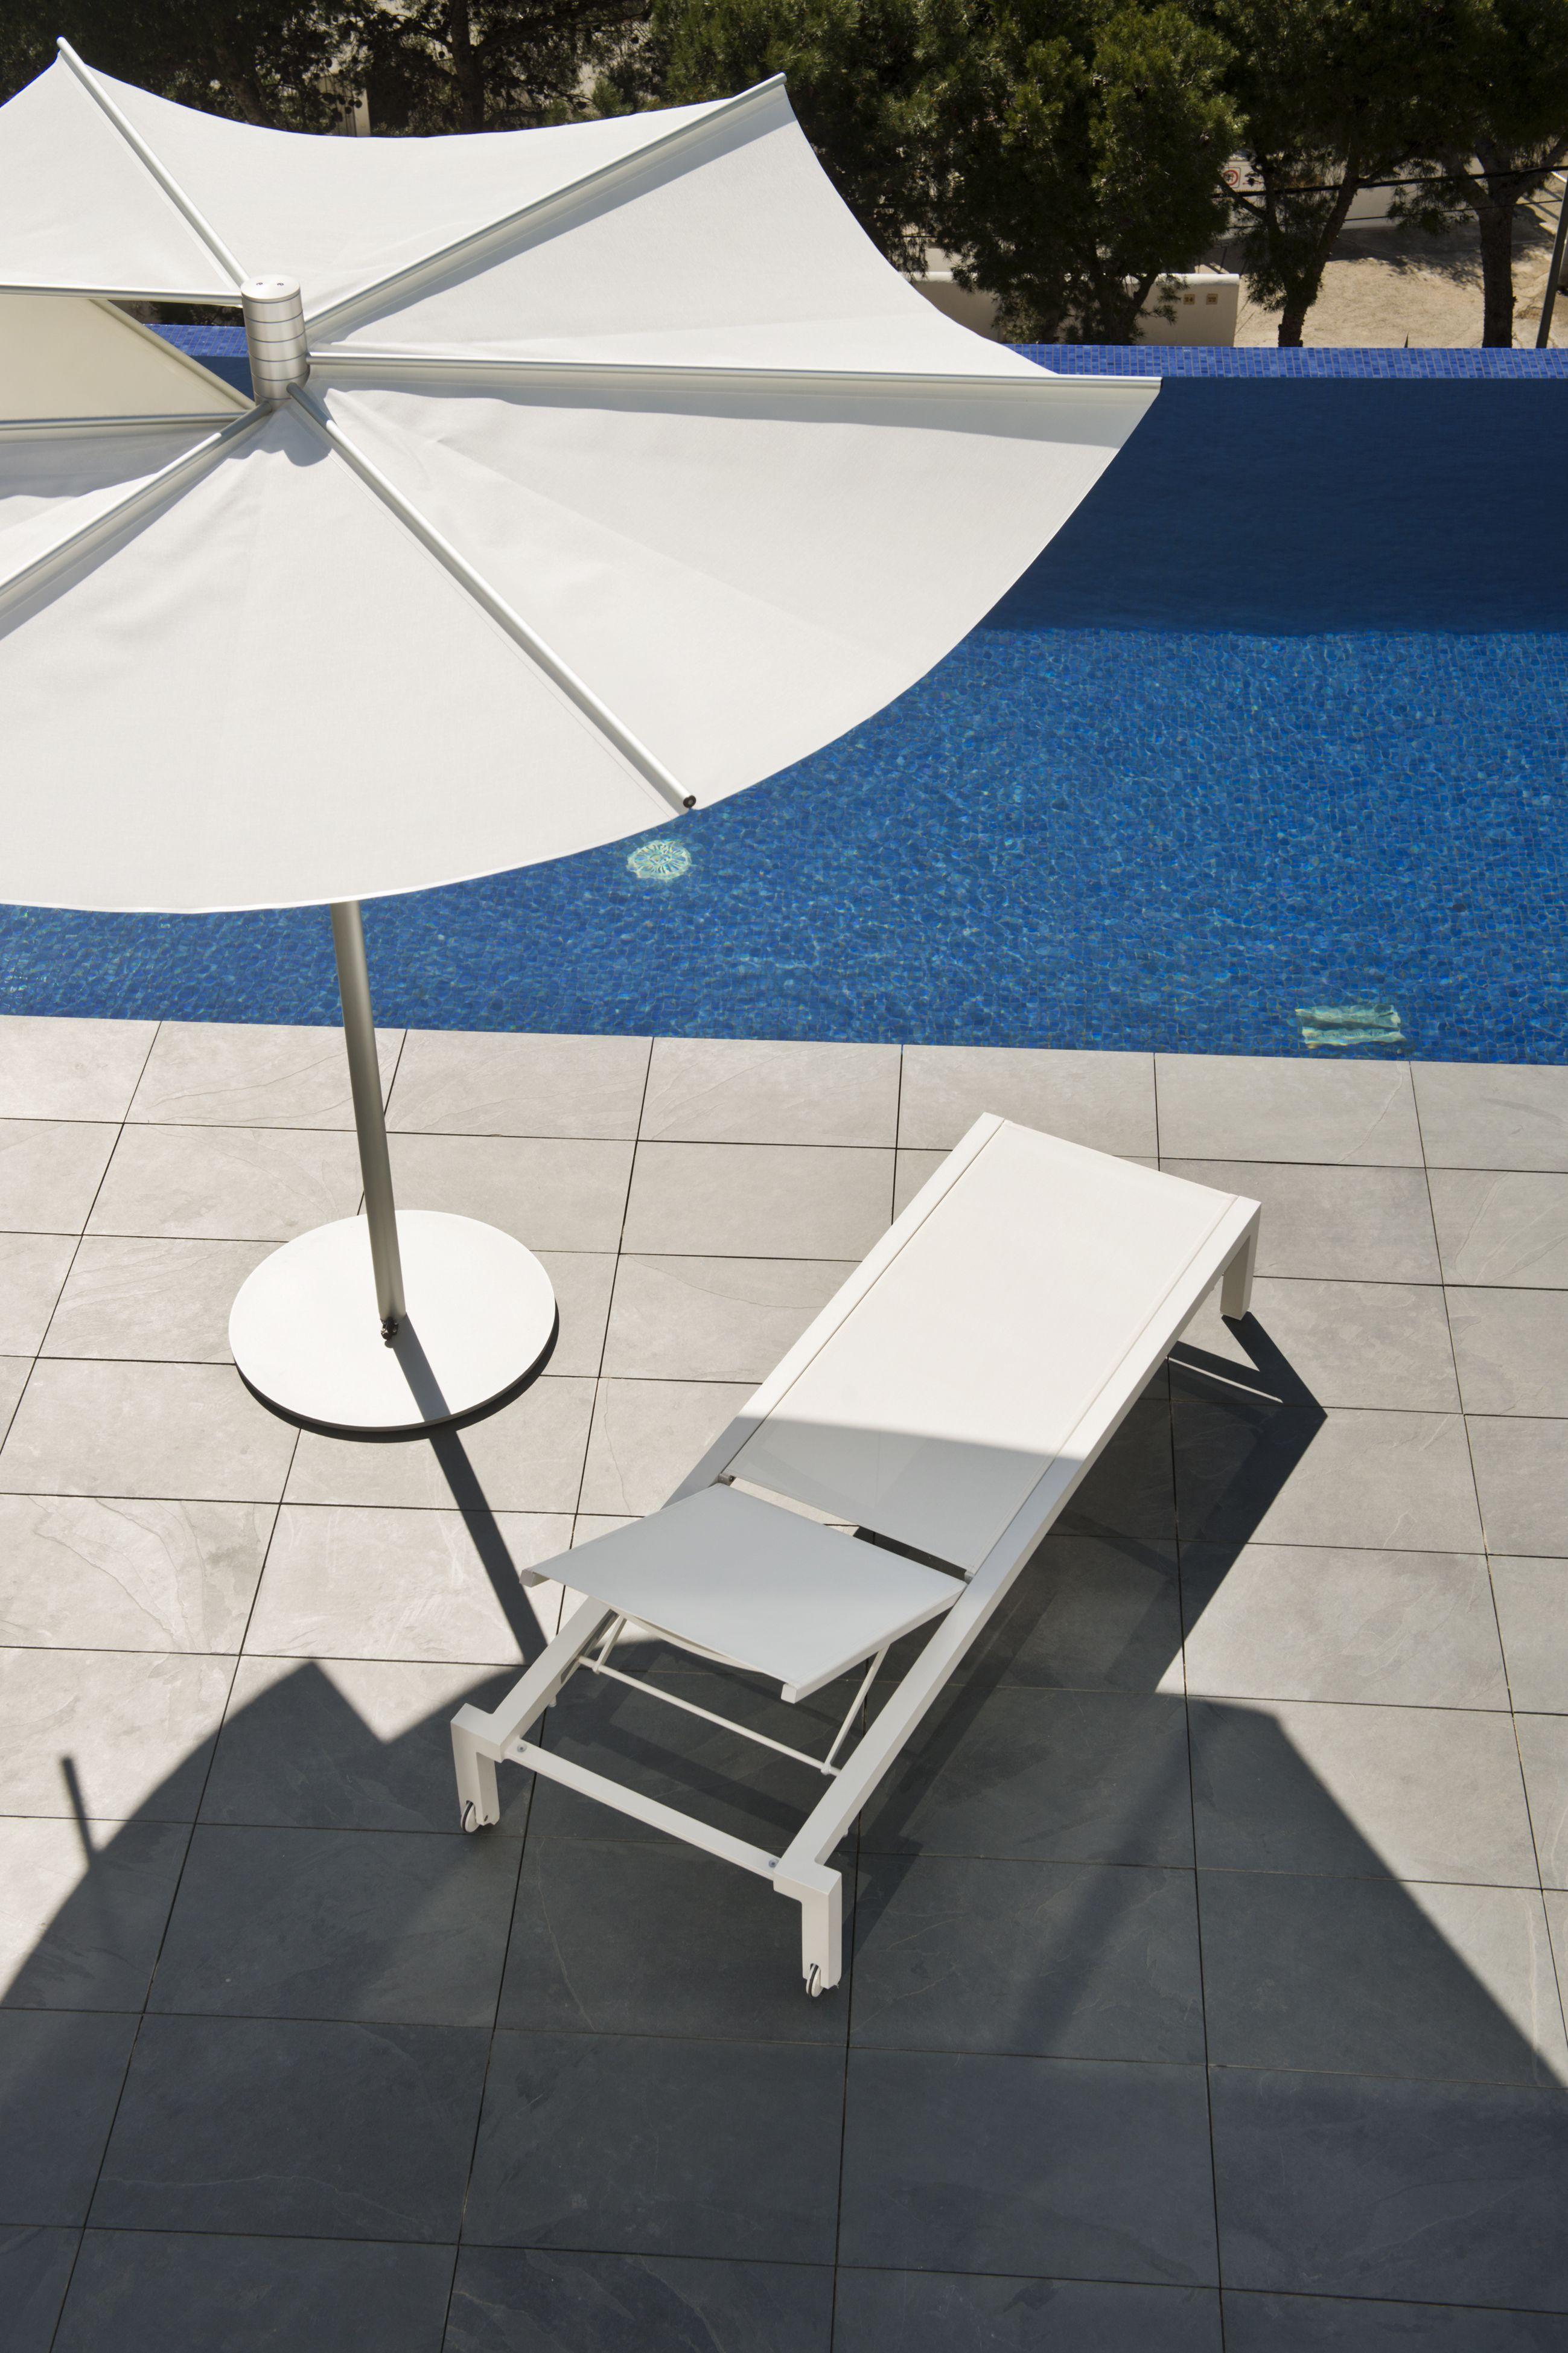 OM sun shade & UNA sun loungers www.calma.cat